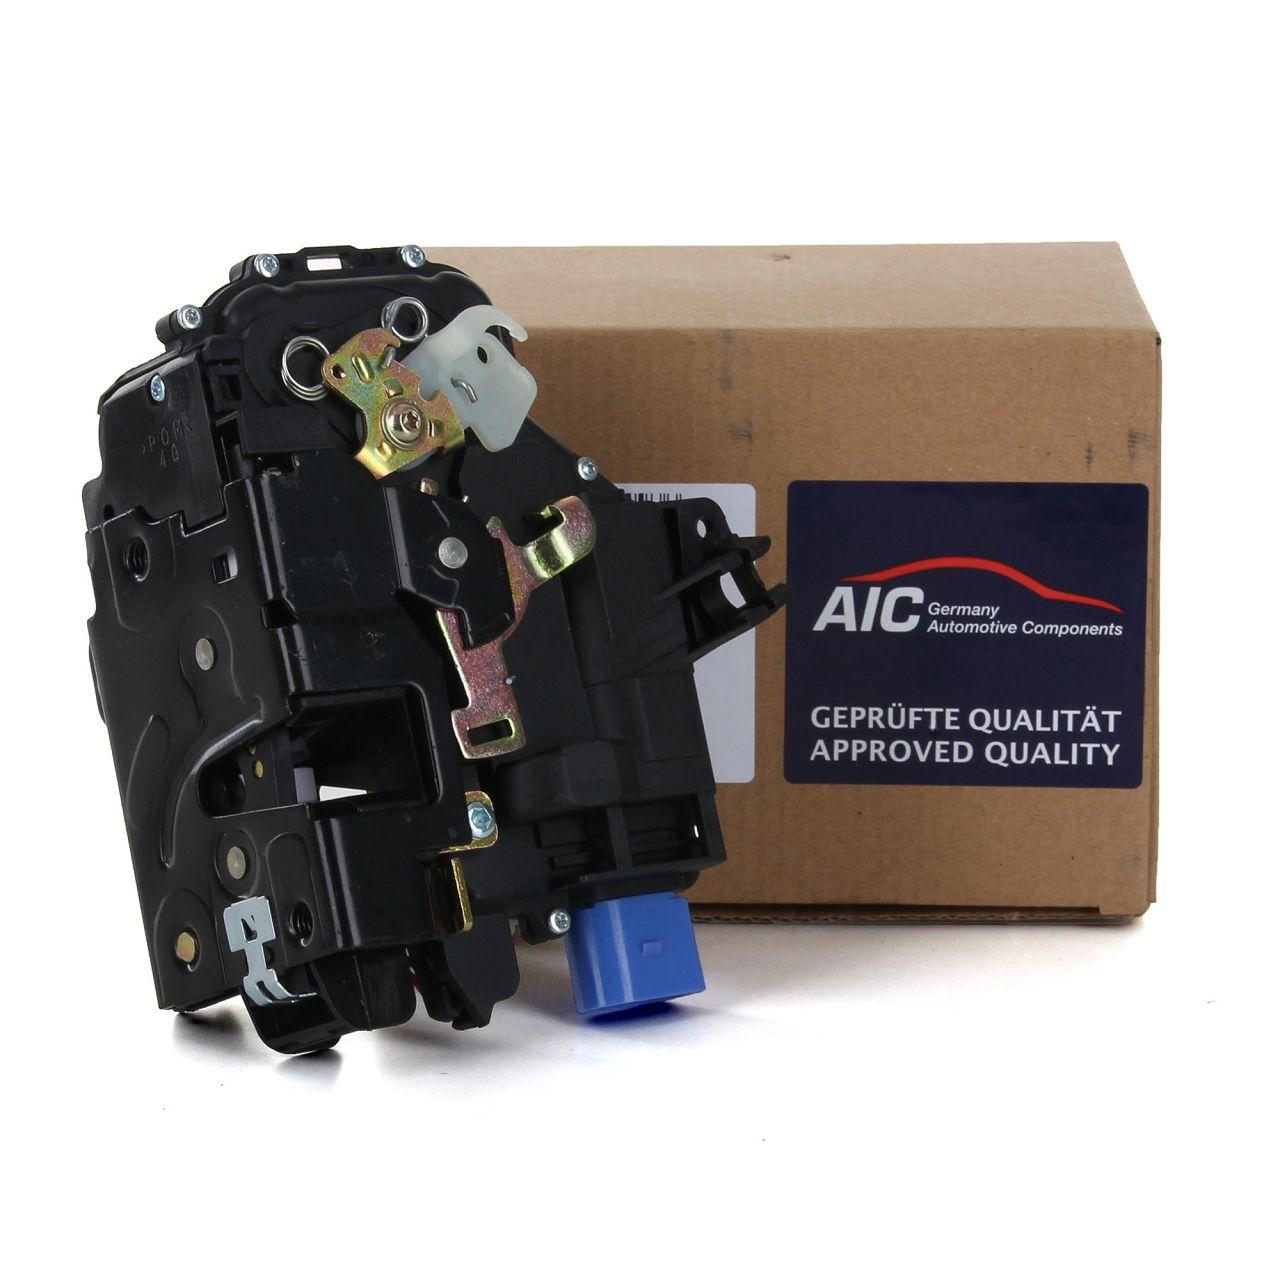 AIC Türschloss Stellmotor Fahrertür SEAT Ibiza 3 SKODA Fabia 1 VW Polo T5 vorne links